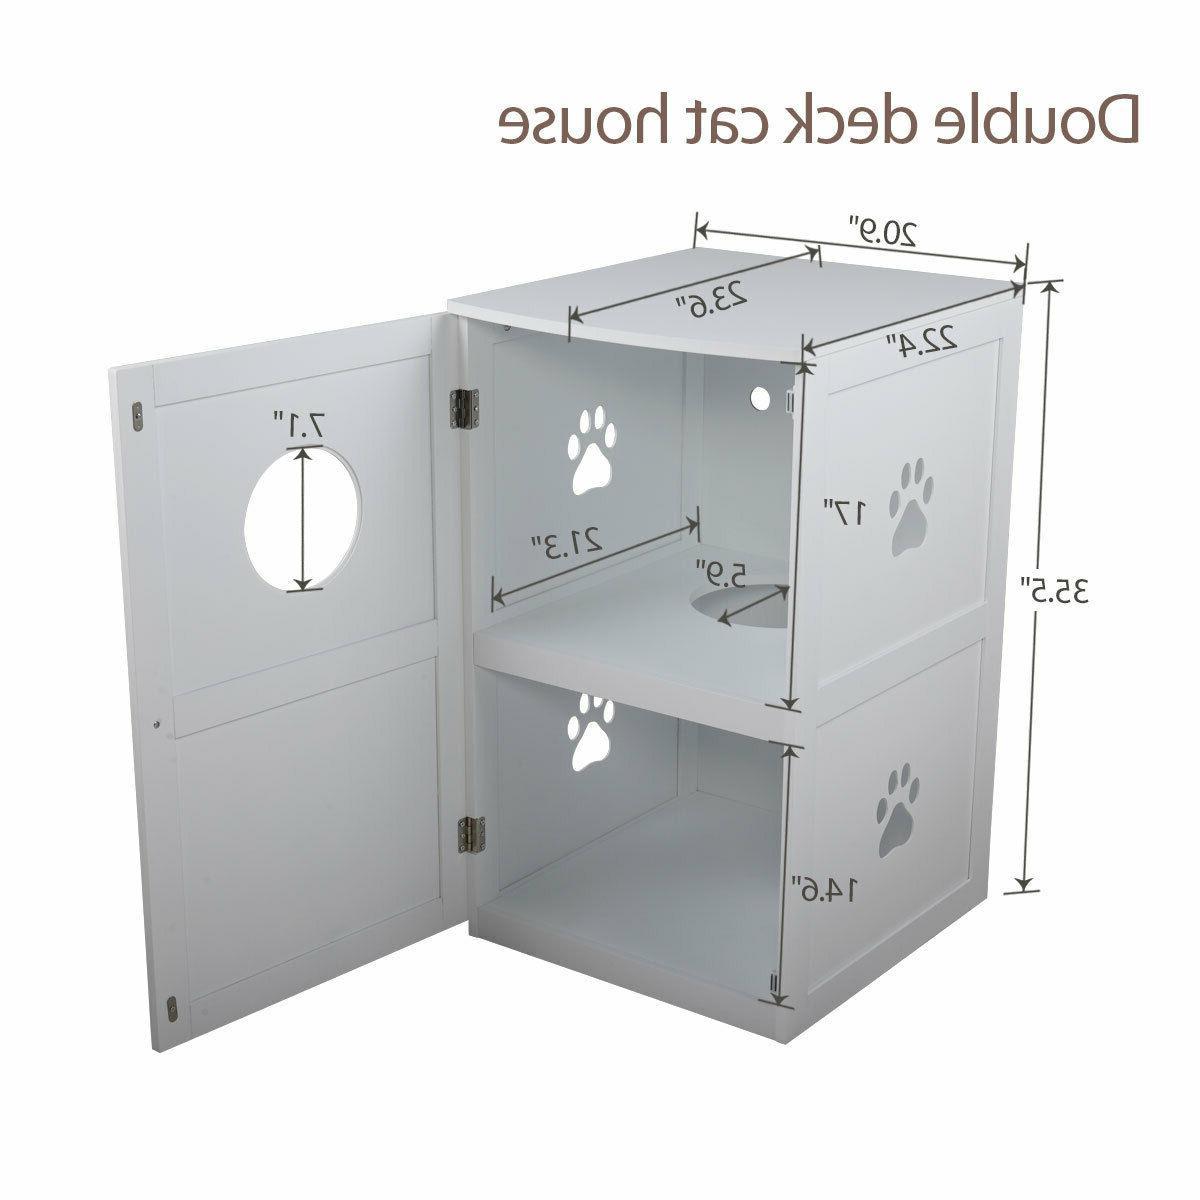 White box House Nightstand Enclosure Furniture